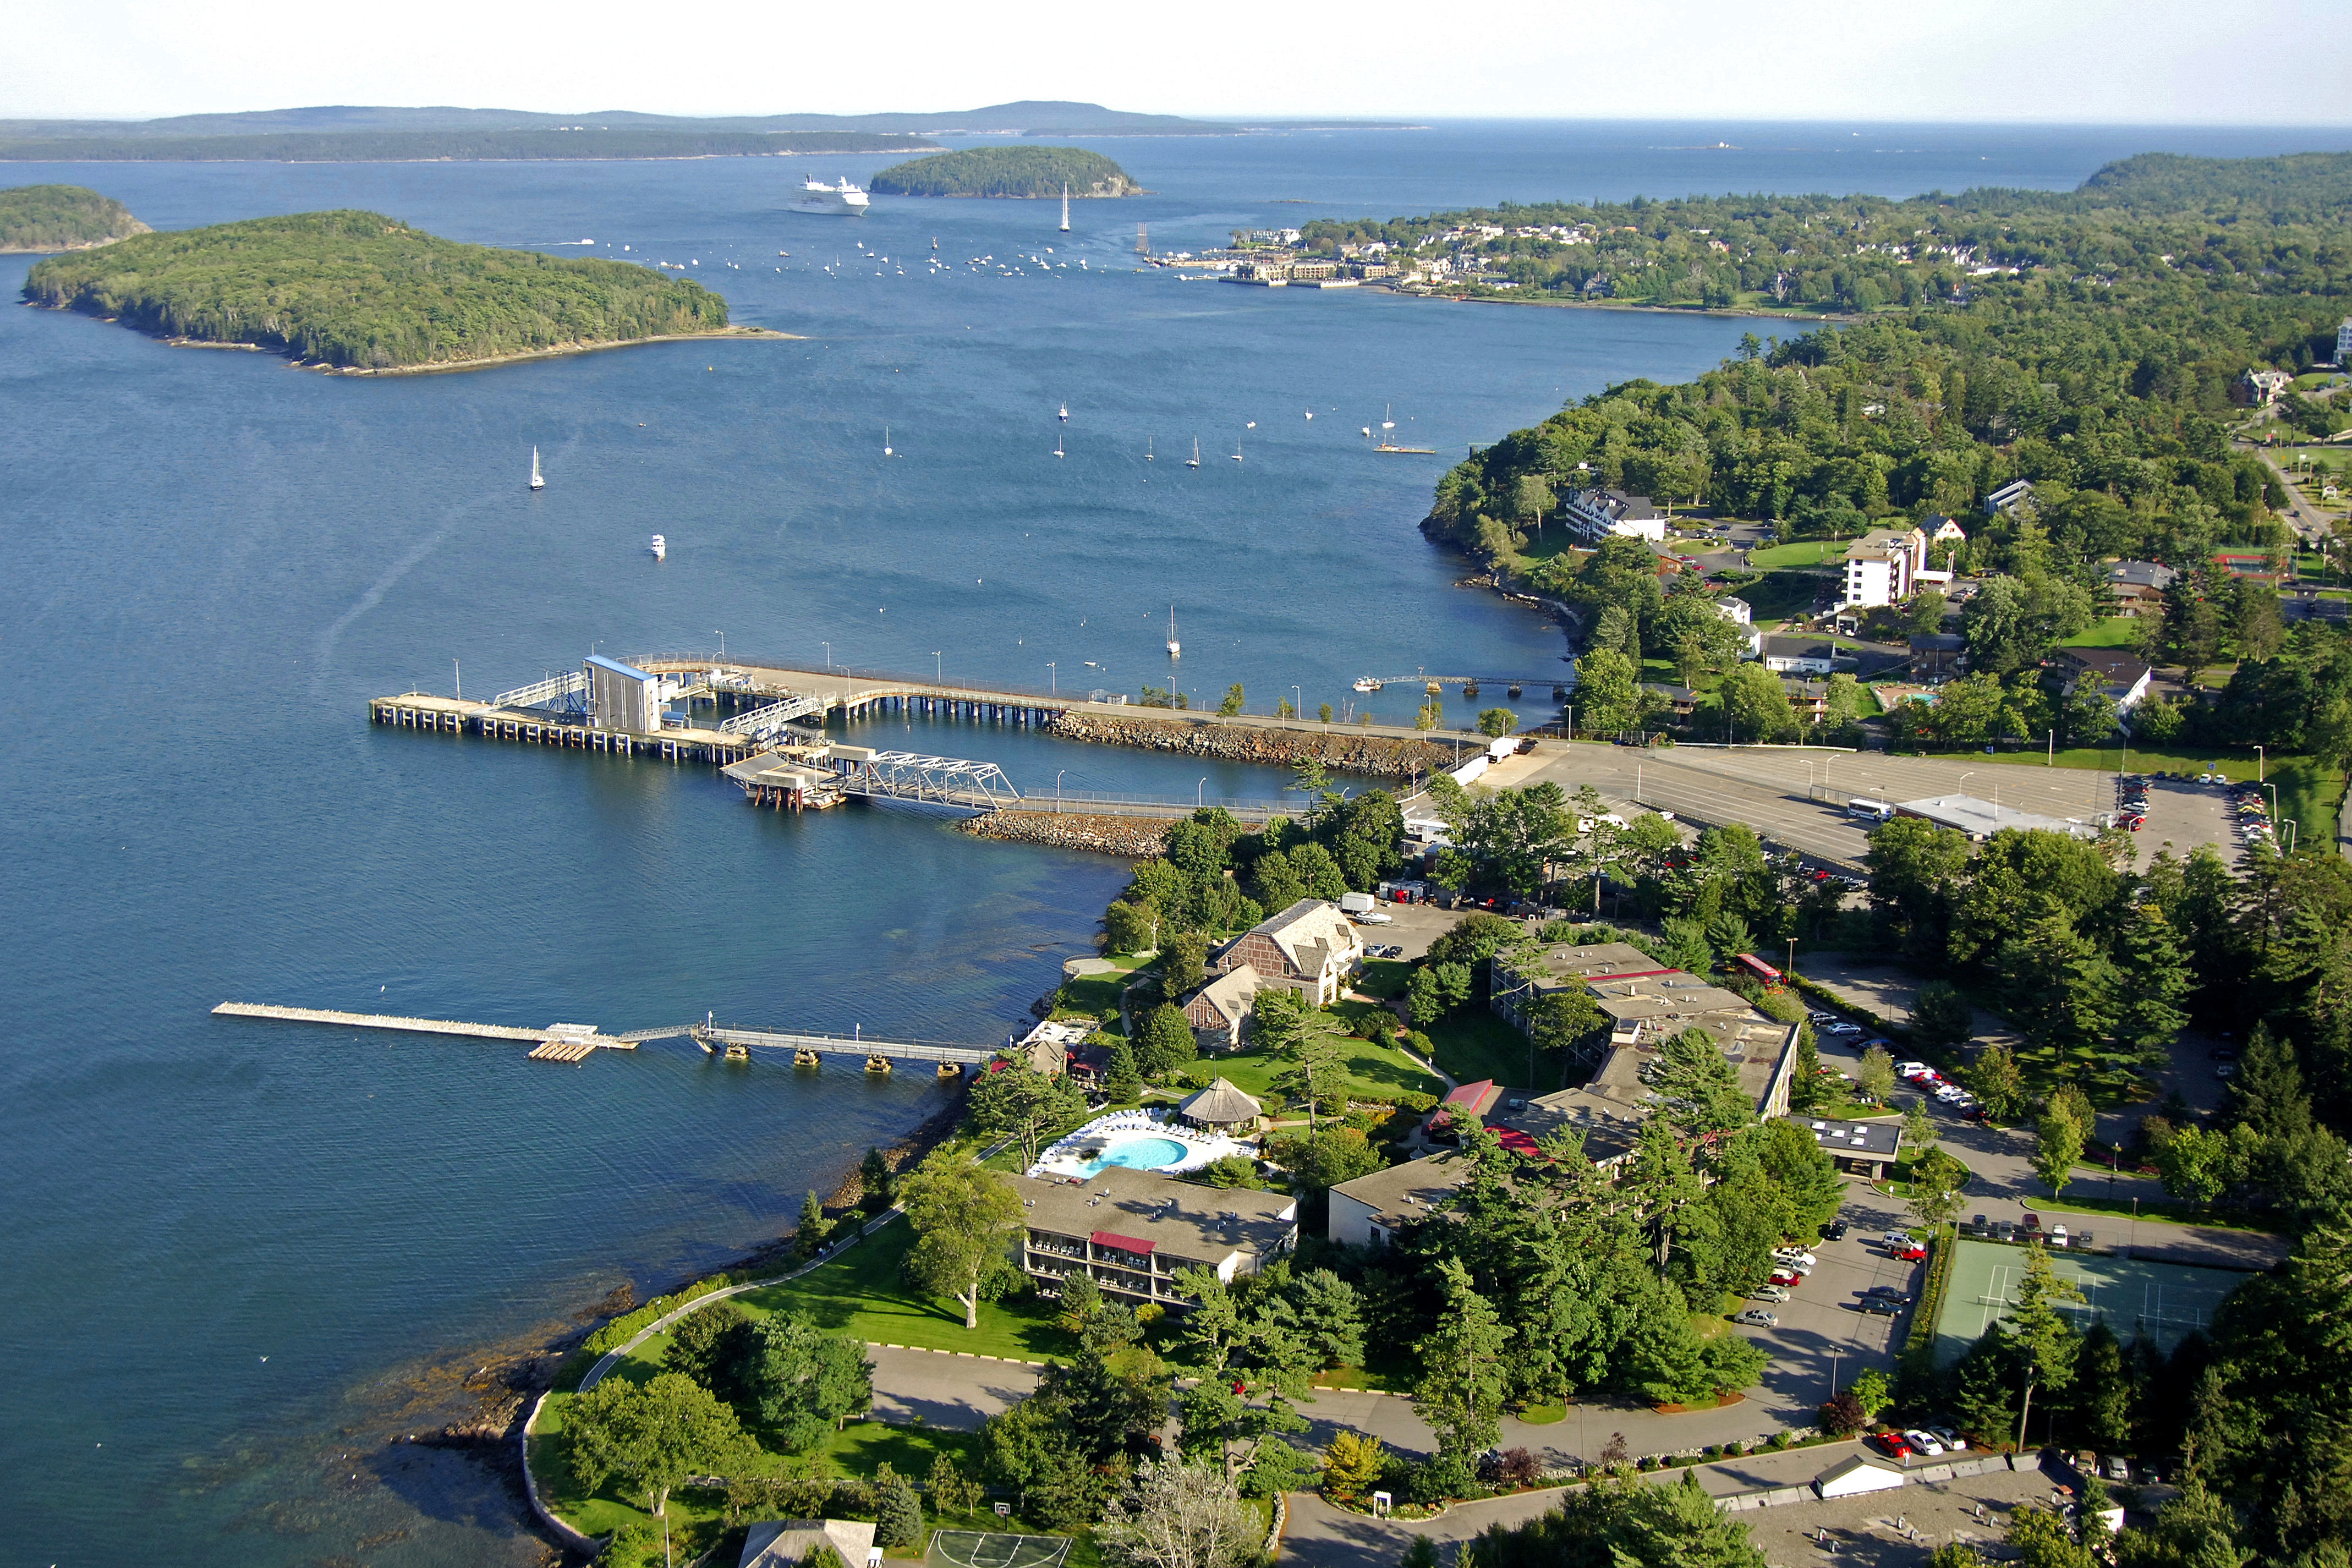 Bar Harbor Maine Hotels >> Bar Harbor Regency Hotel Marina In Bar Harbor Me United